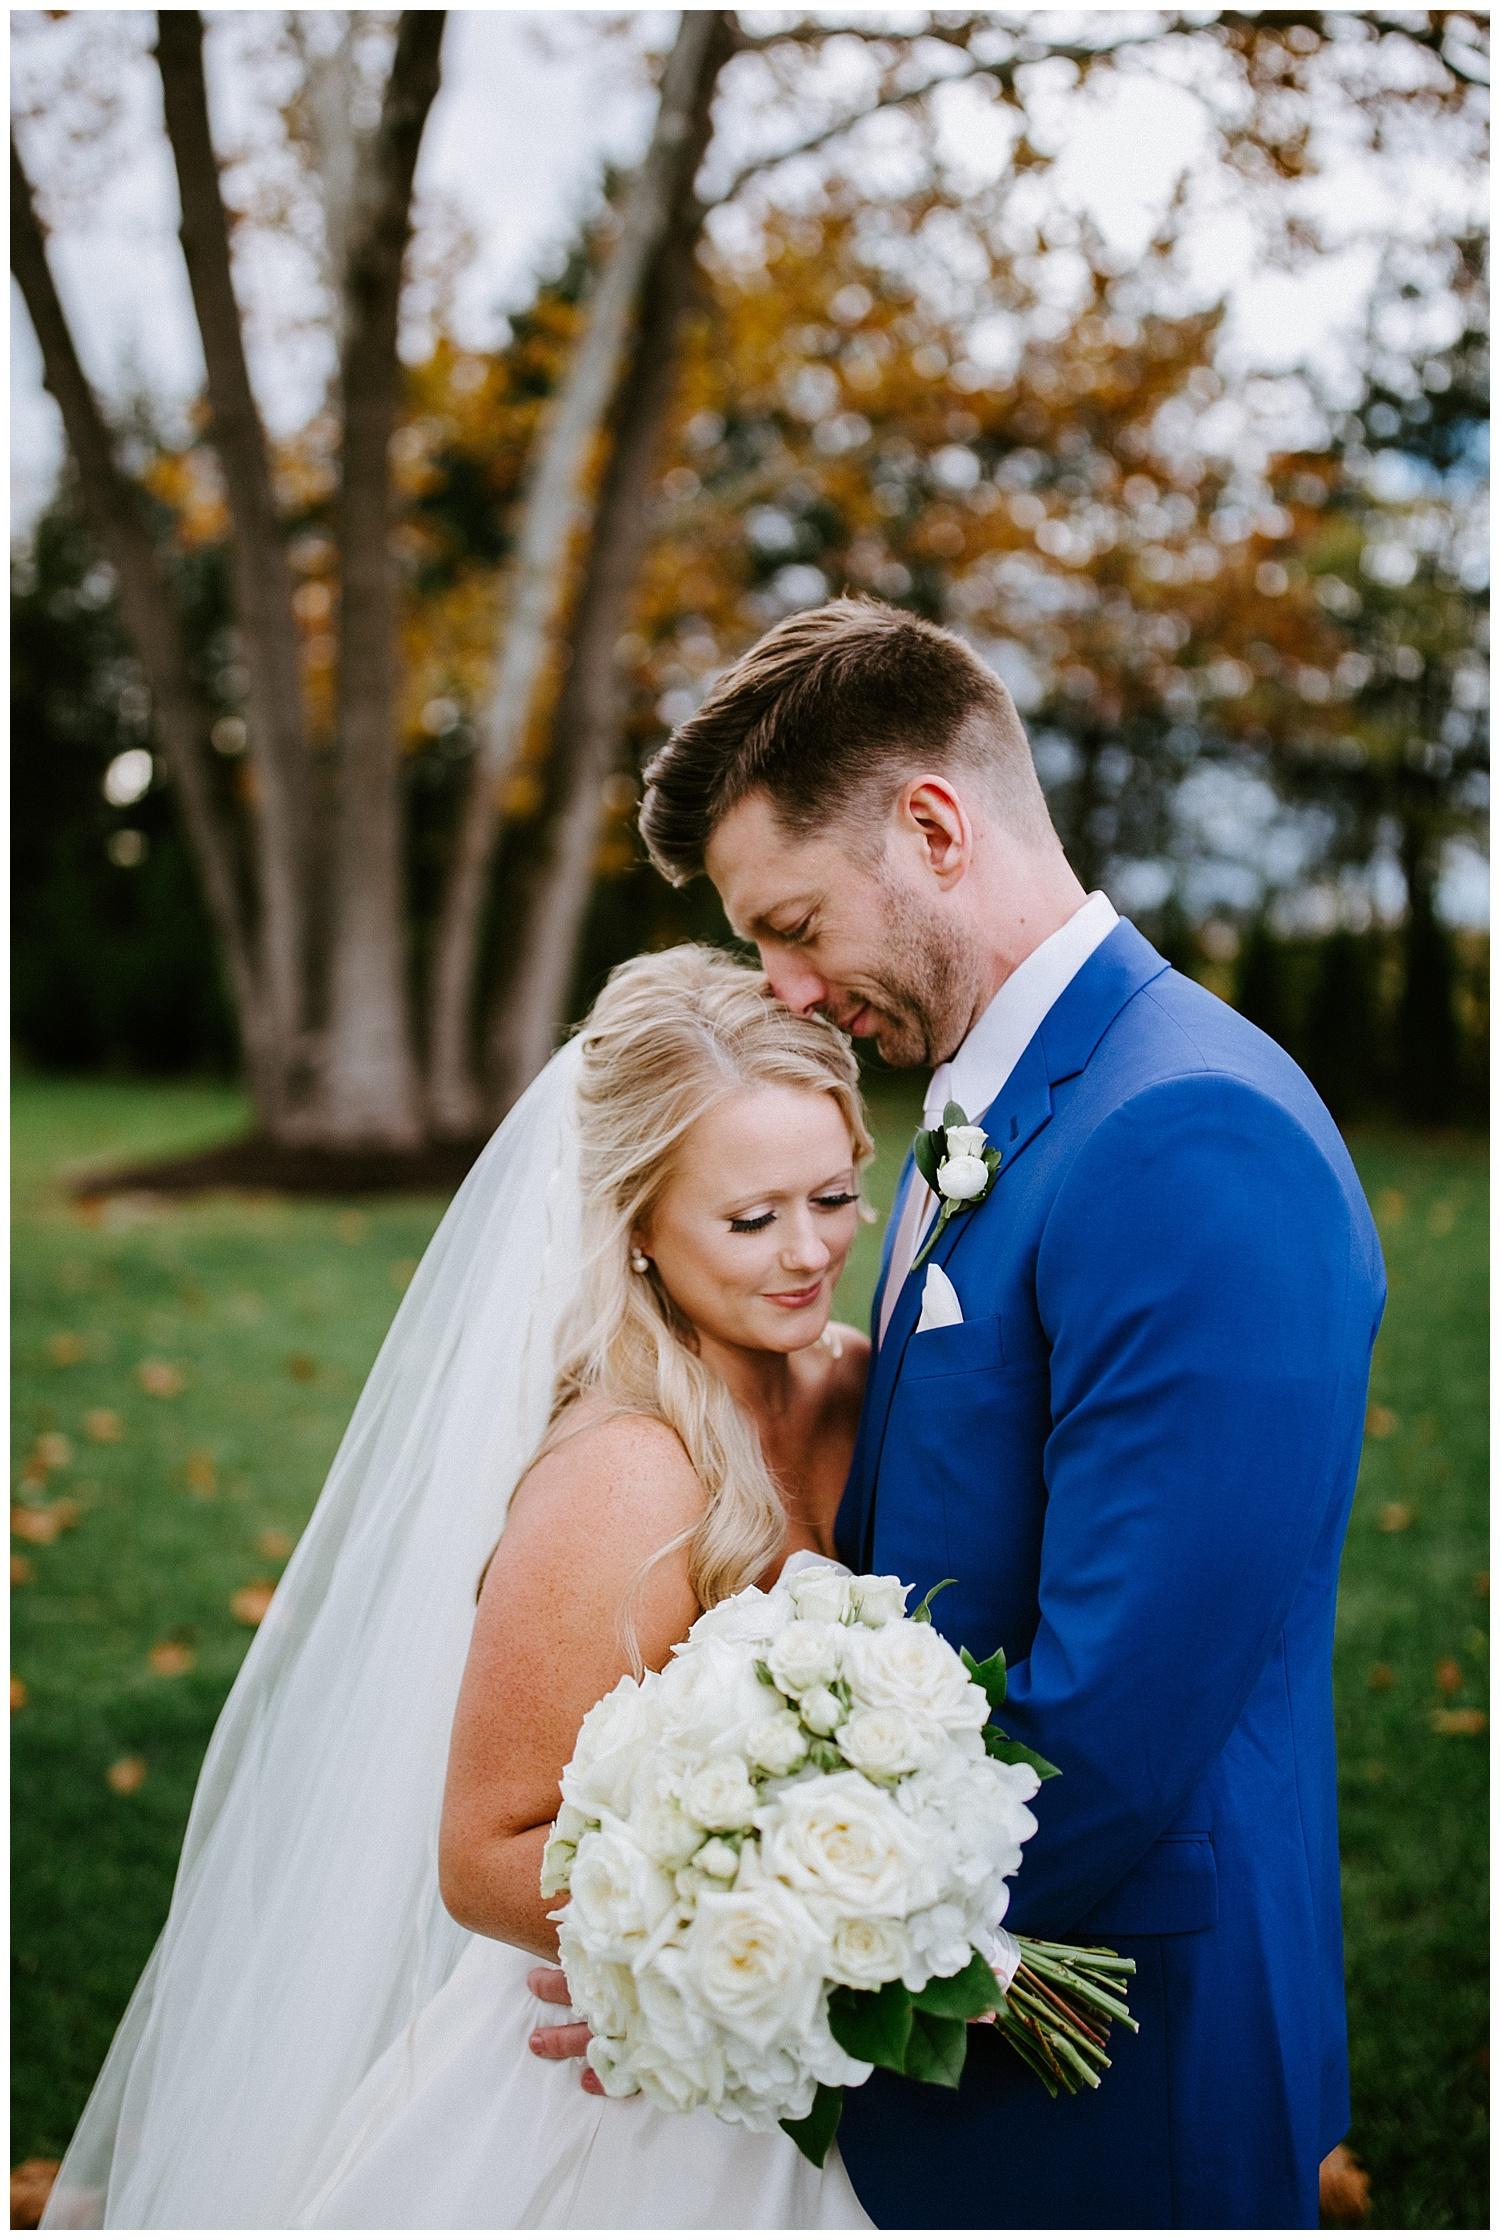 classy-wedding-sycamore_farms-nashville-tn2019-01-22_0030.jpg